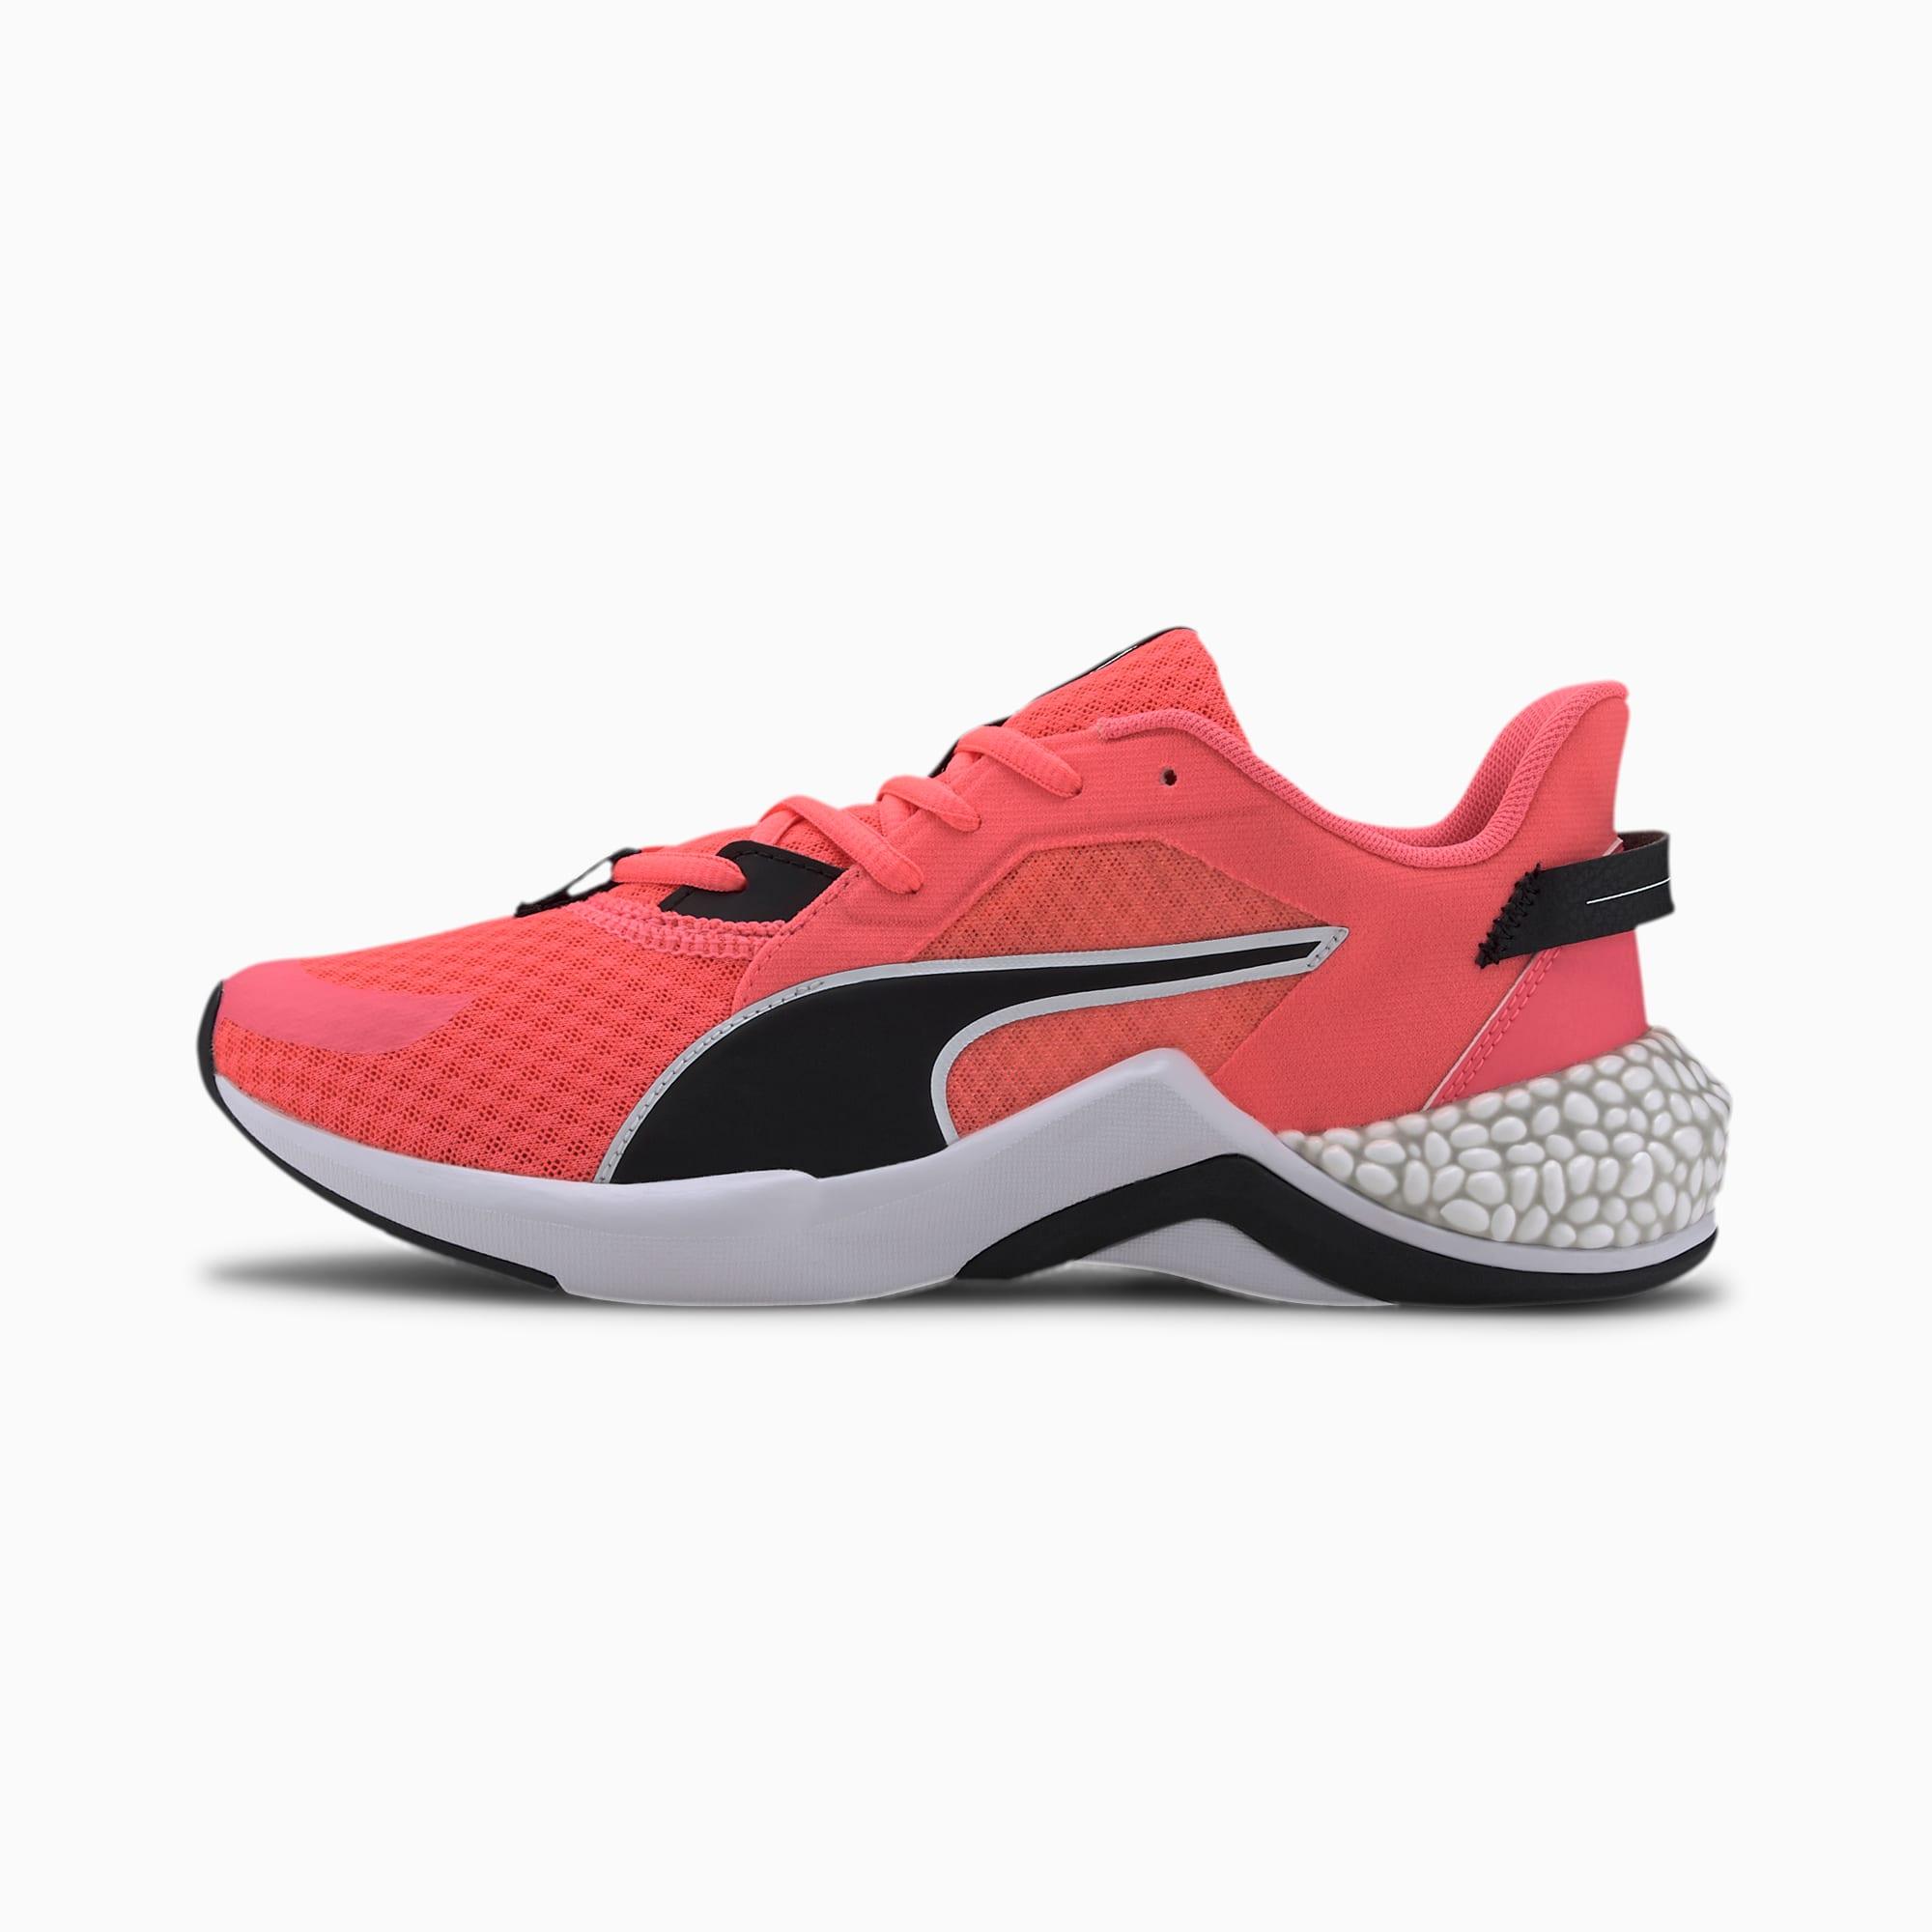 HYBRID NX Ozone Women's Running Shoes